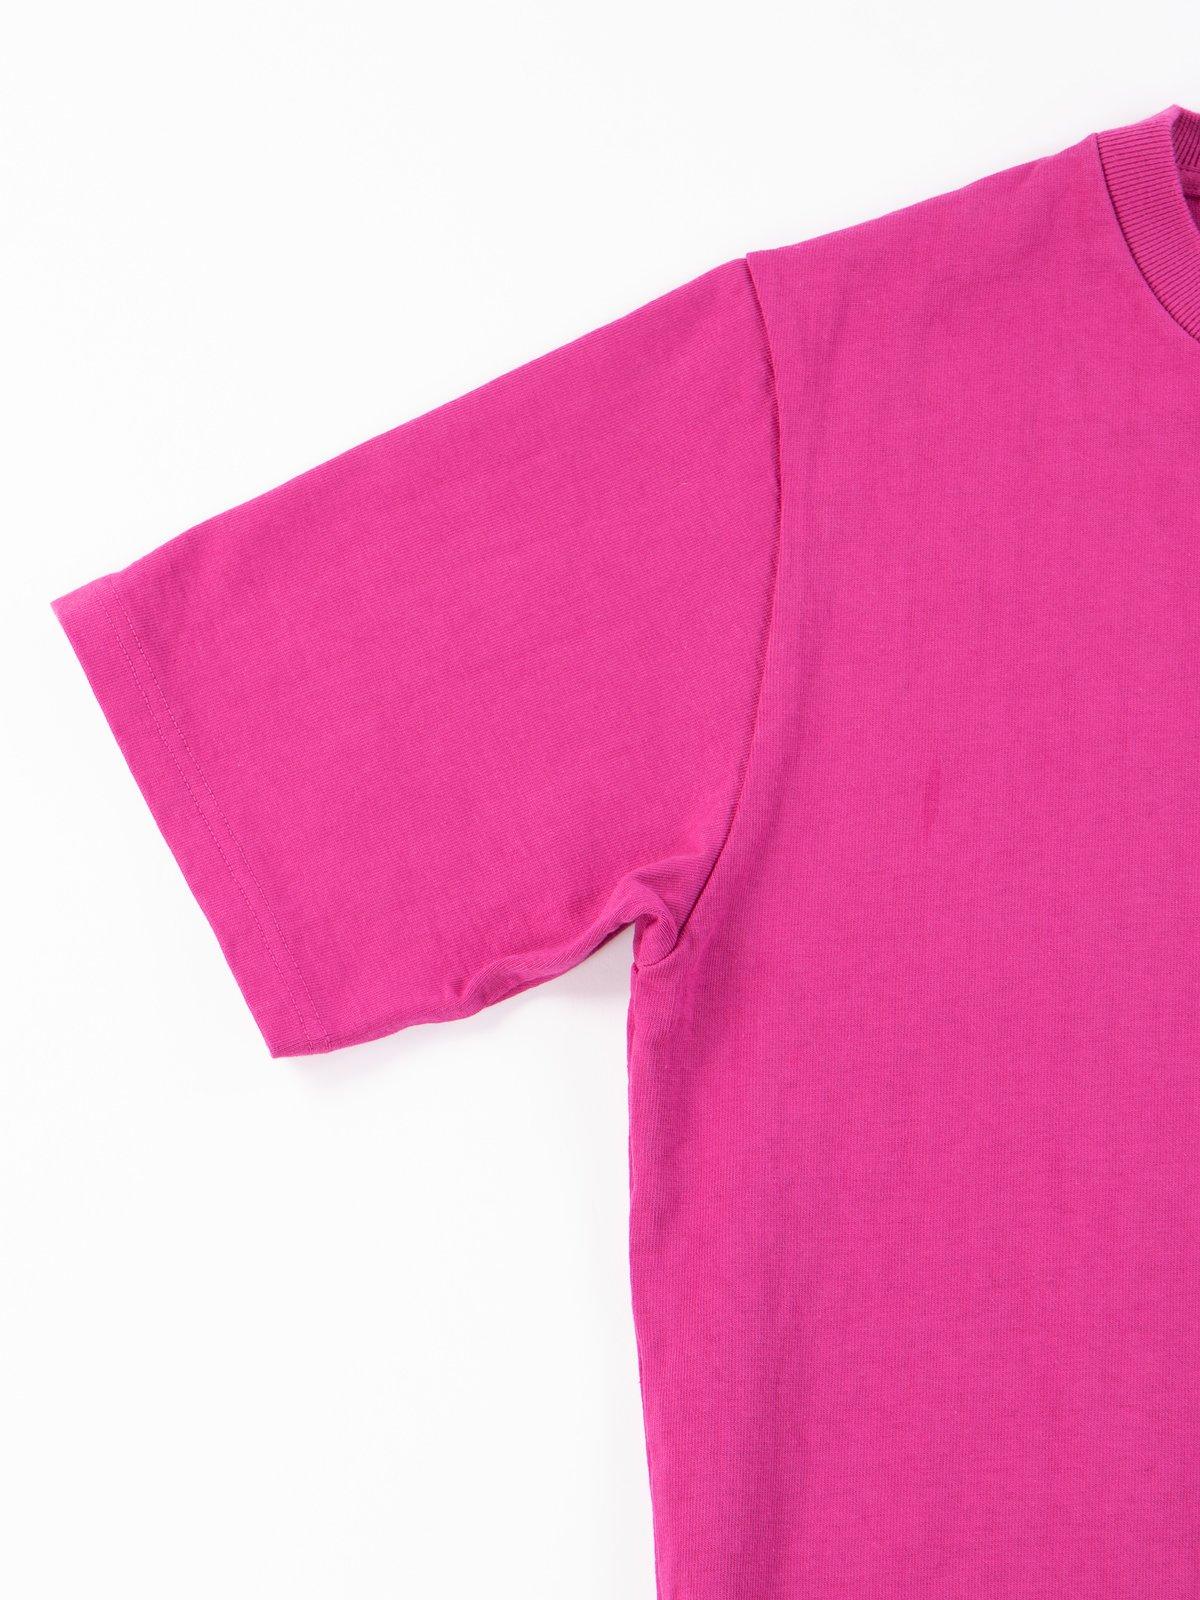 Ash Rose Dotsume Pocket T–Shirt - Image 4